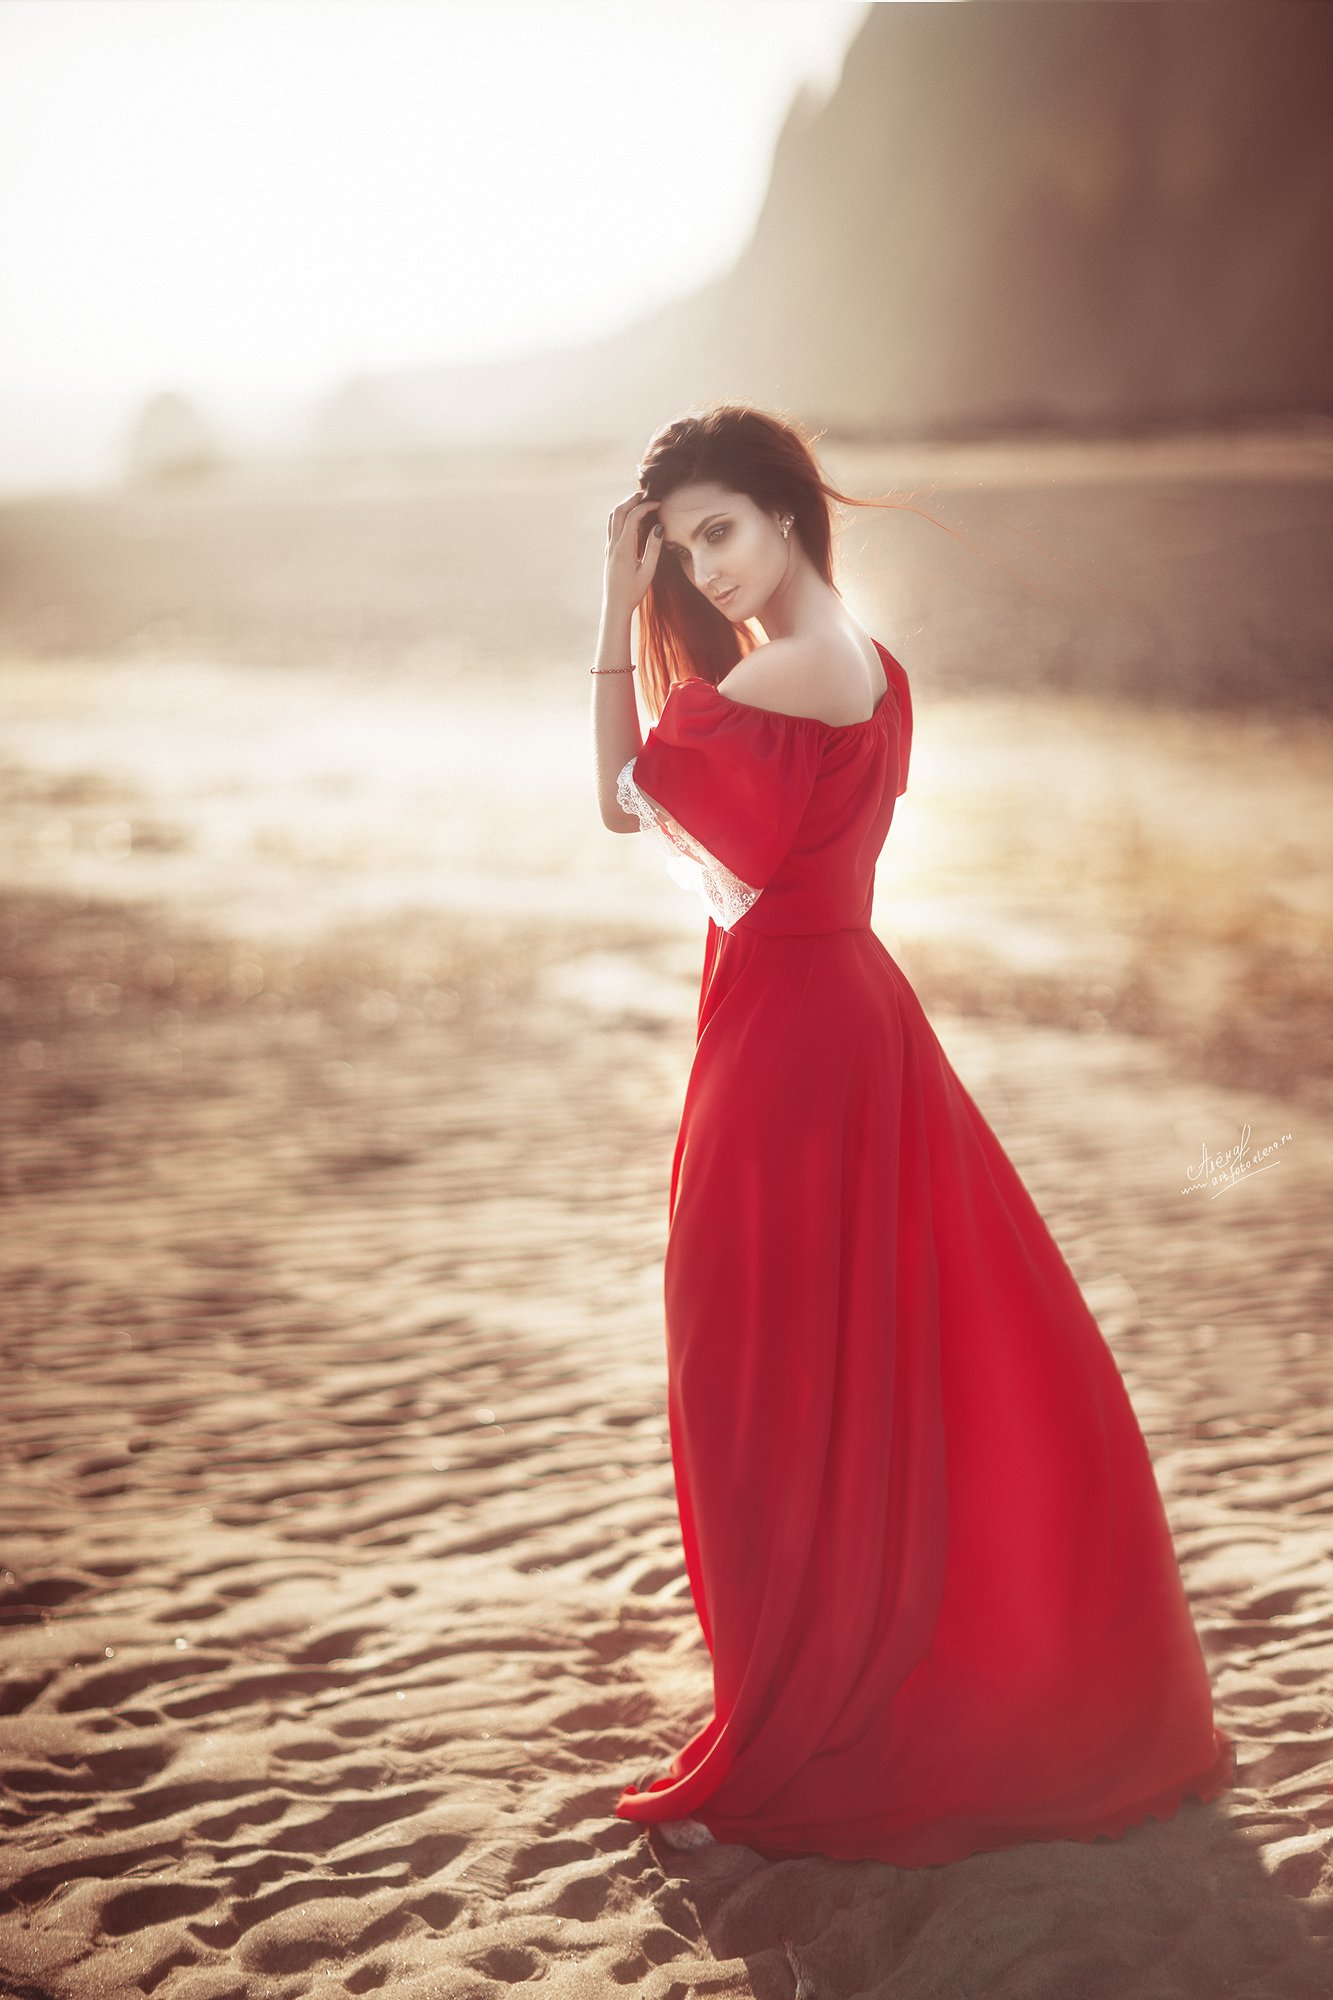 девушки портрет море красное, Яковлева Алена